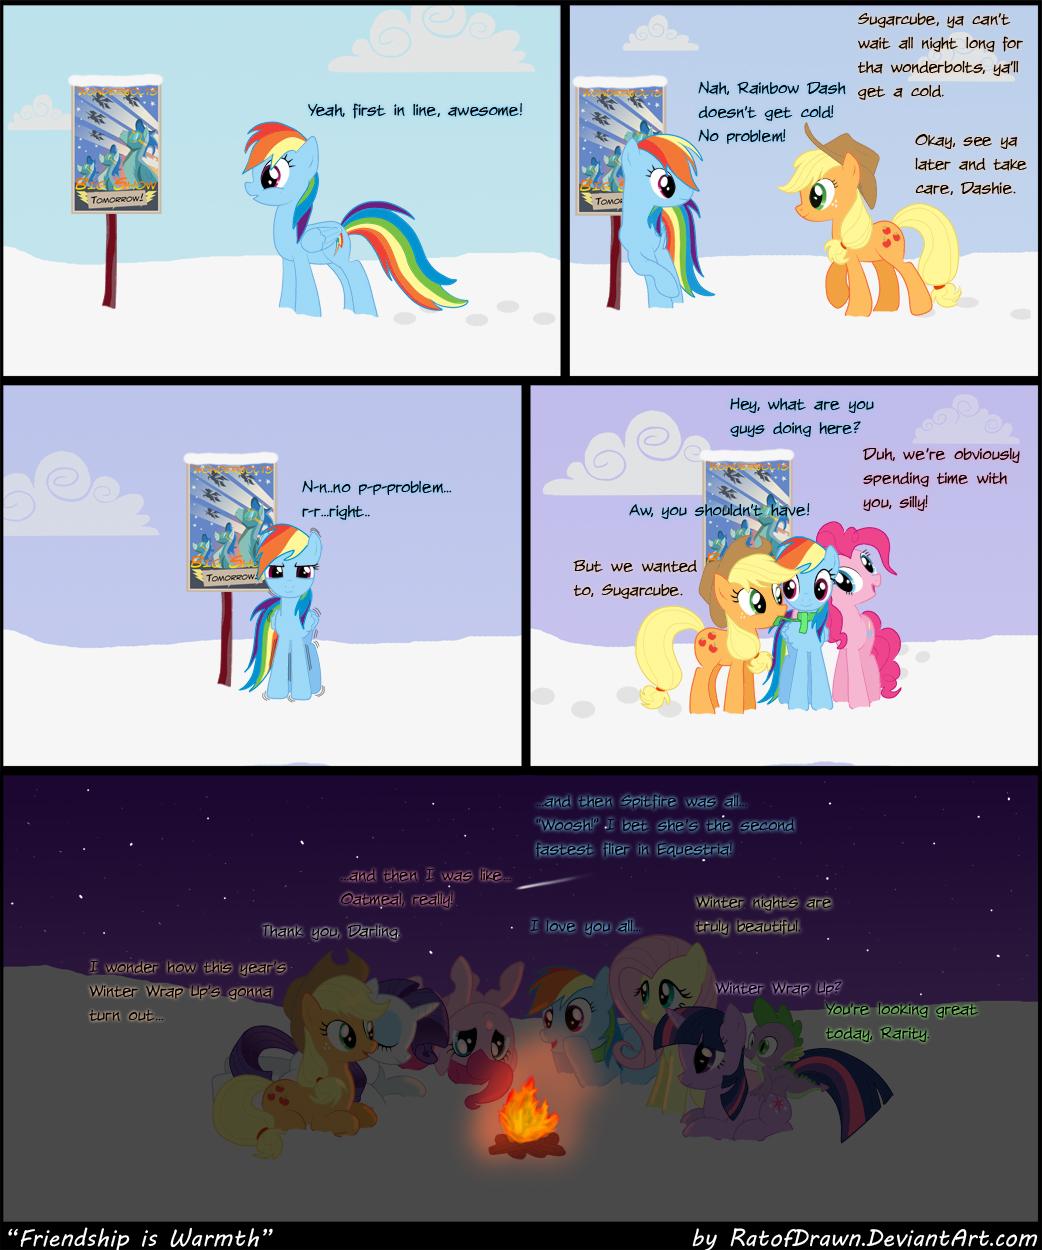 Friendship Is Warmth by RatofDrawn